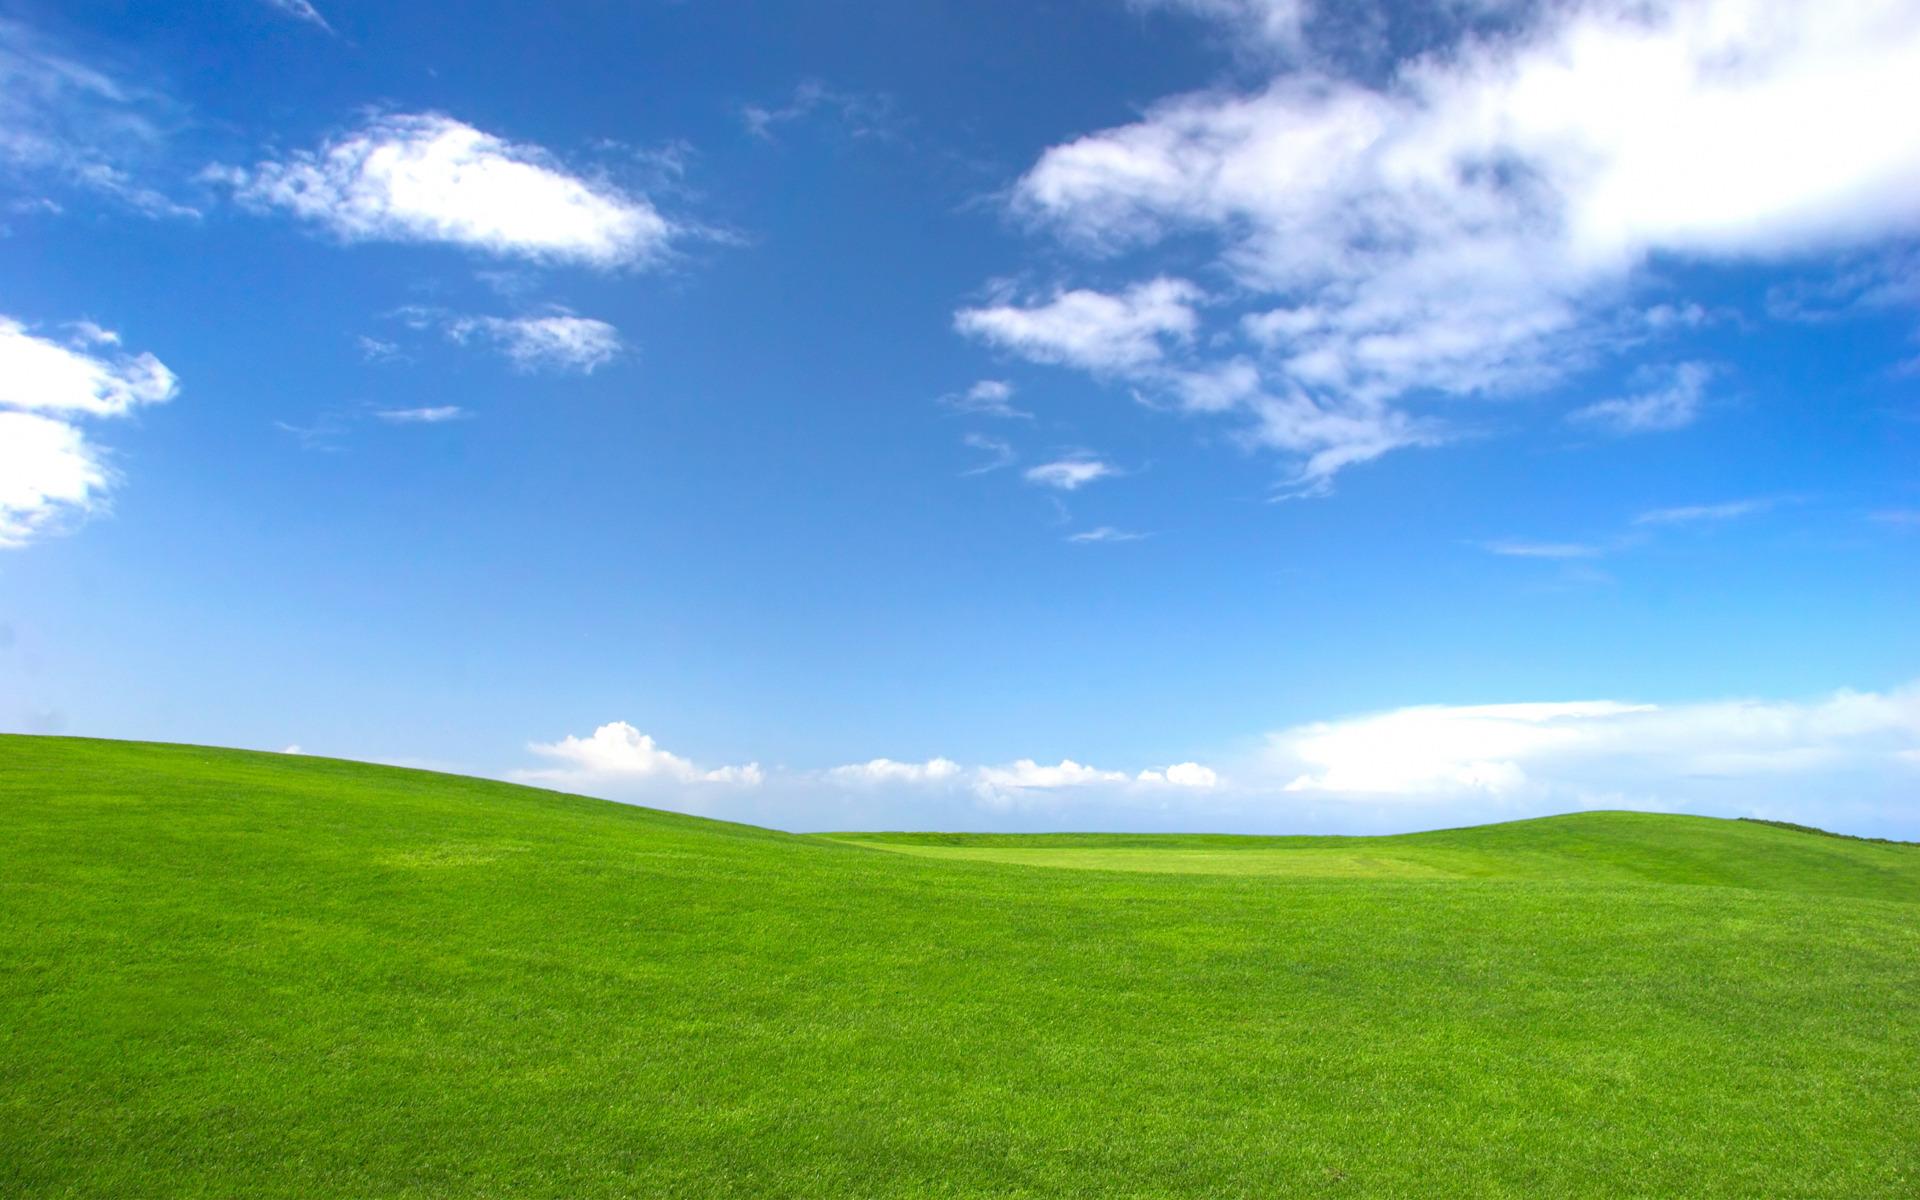 Grass And Sky Wallpaper